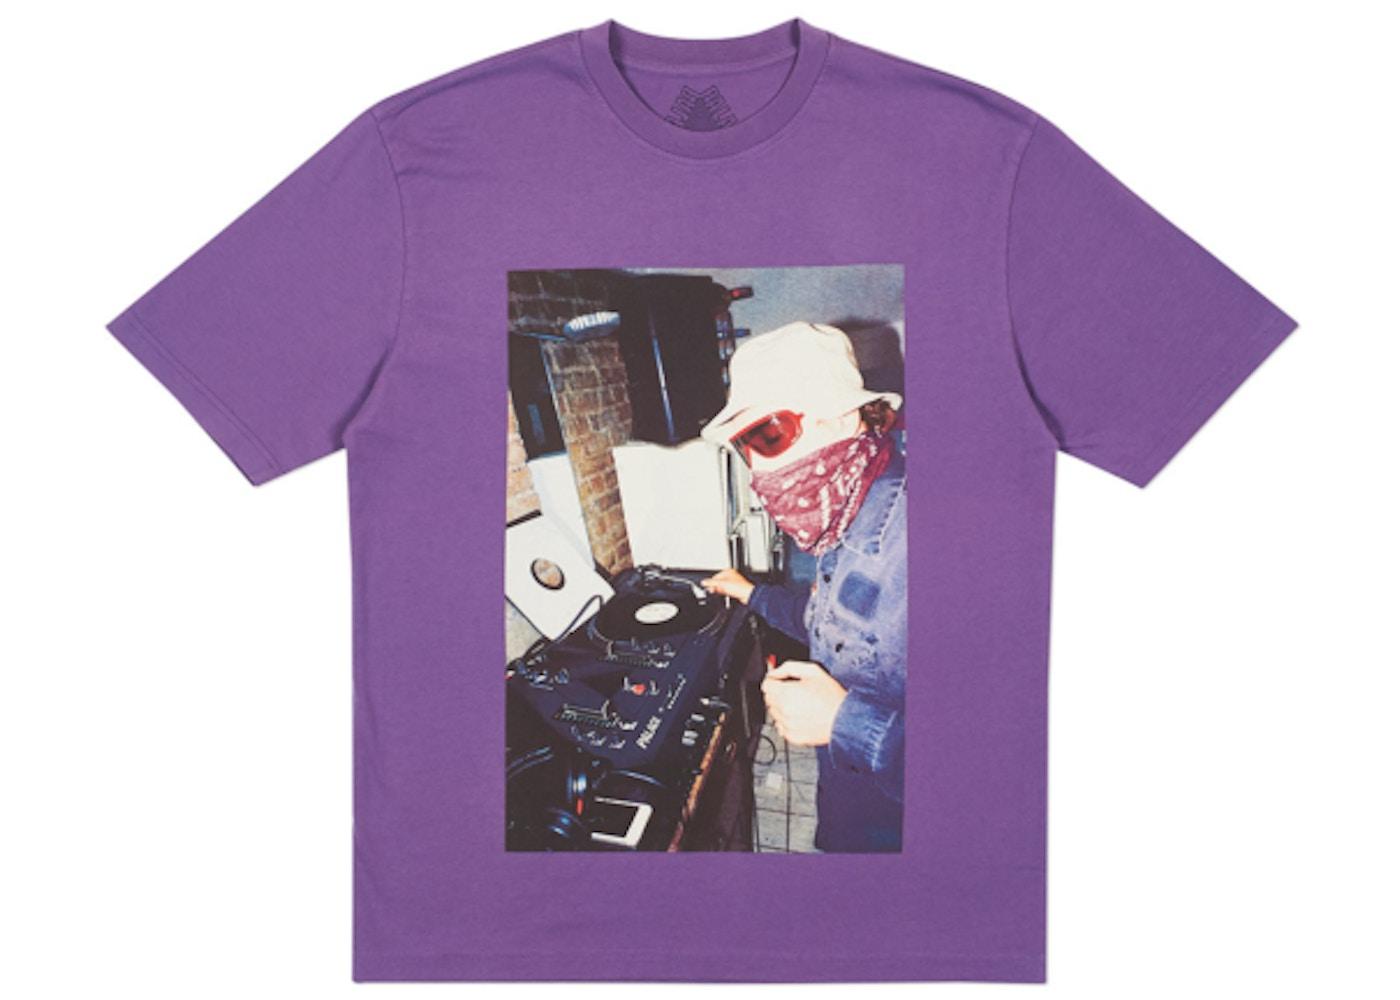 869b86ba7edc Palace Mixer T-Shirt Purple - FW18